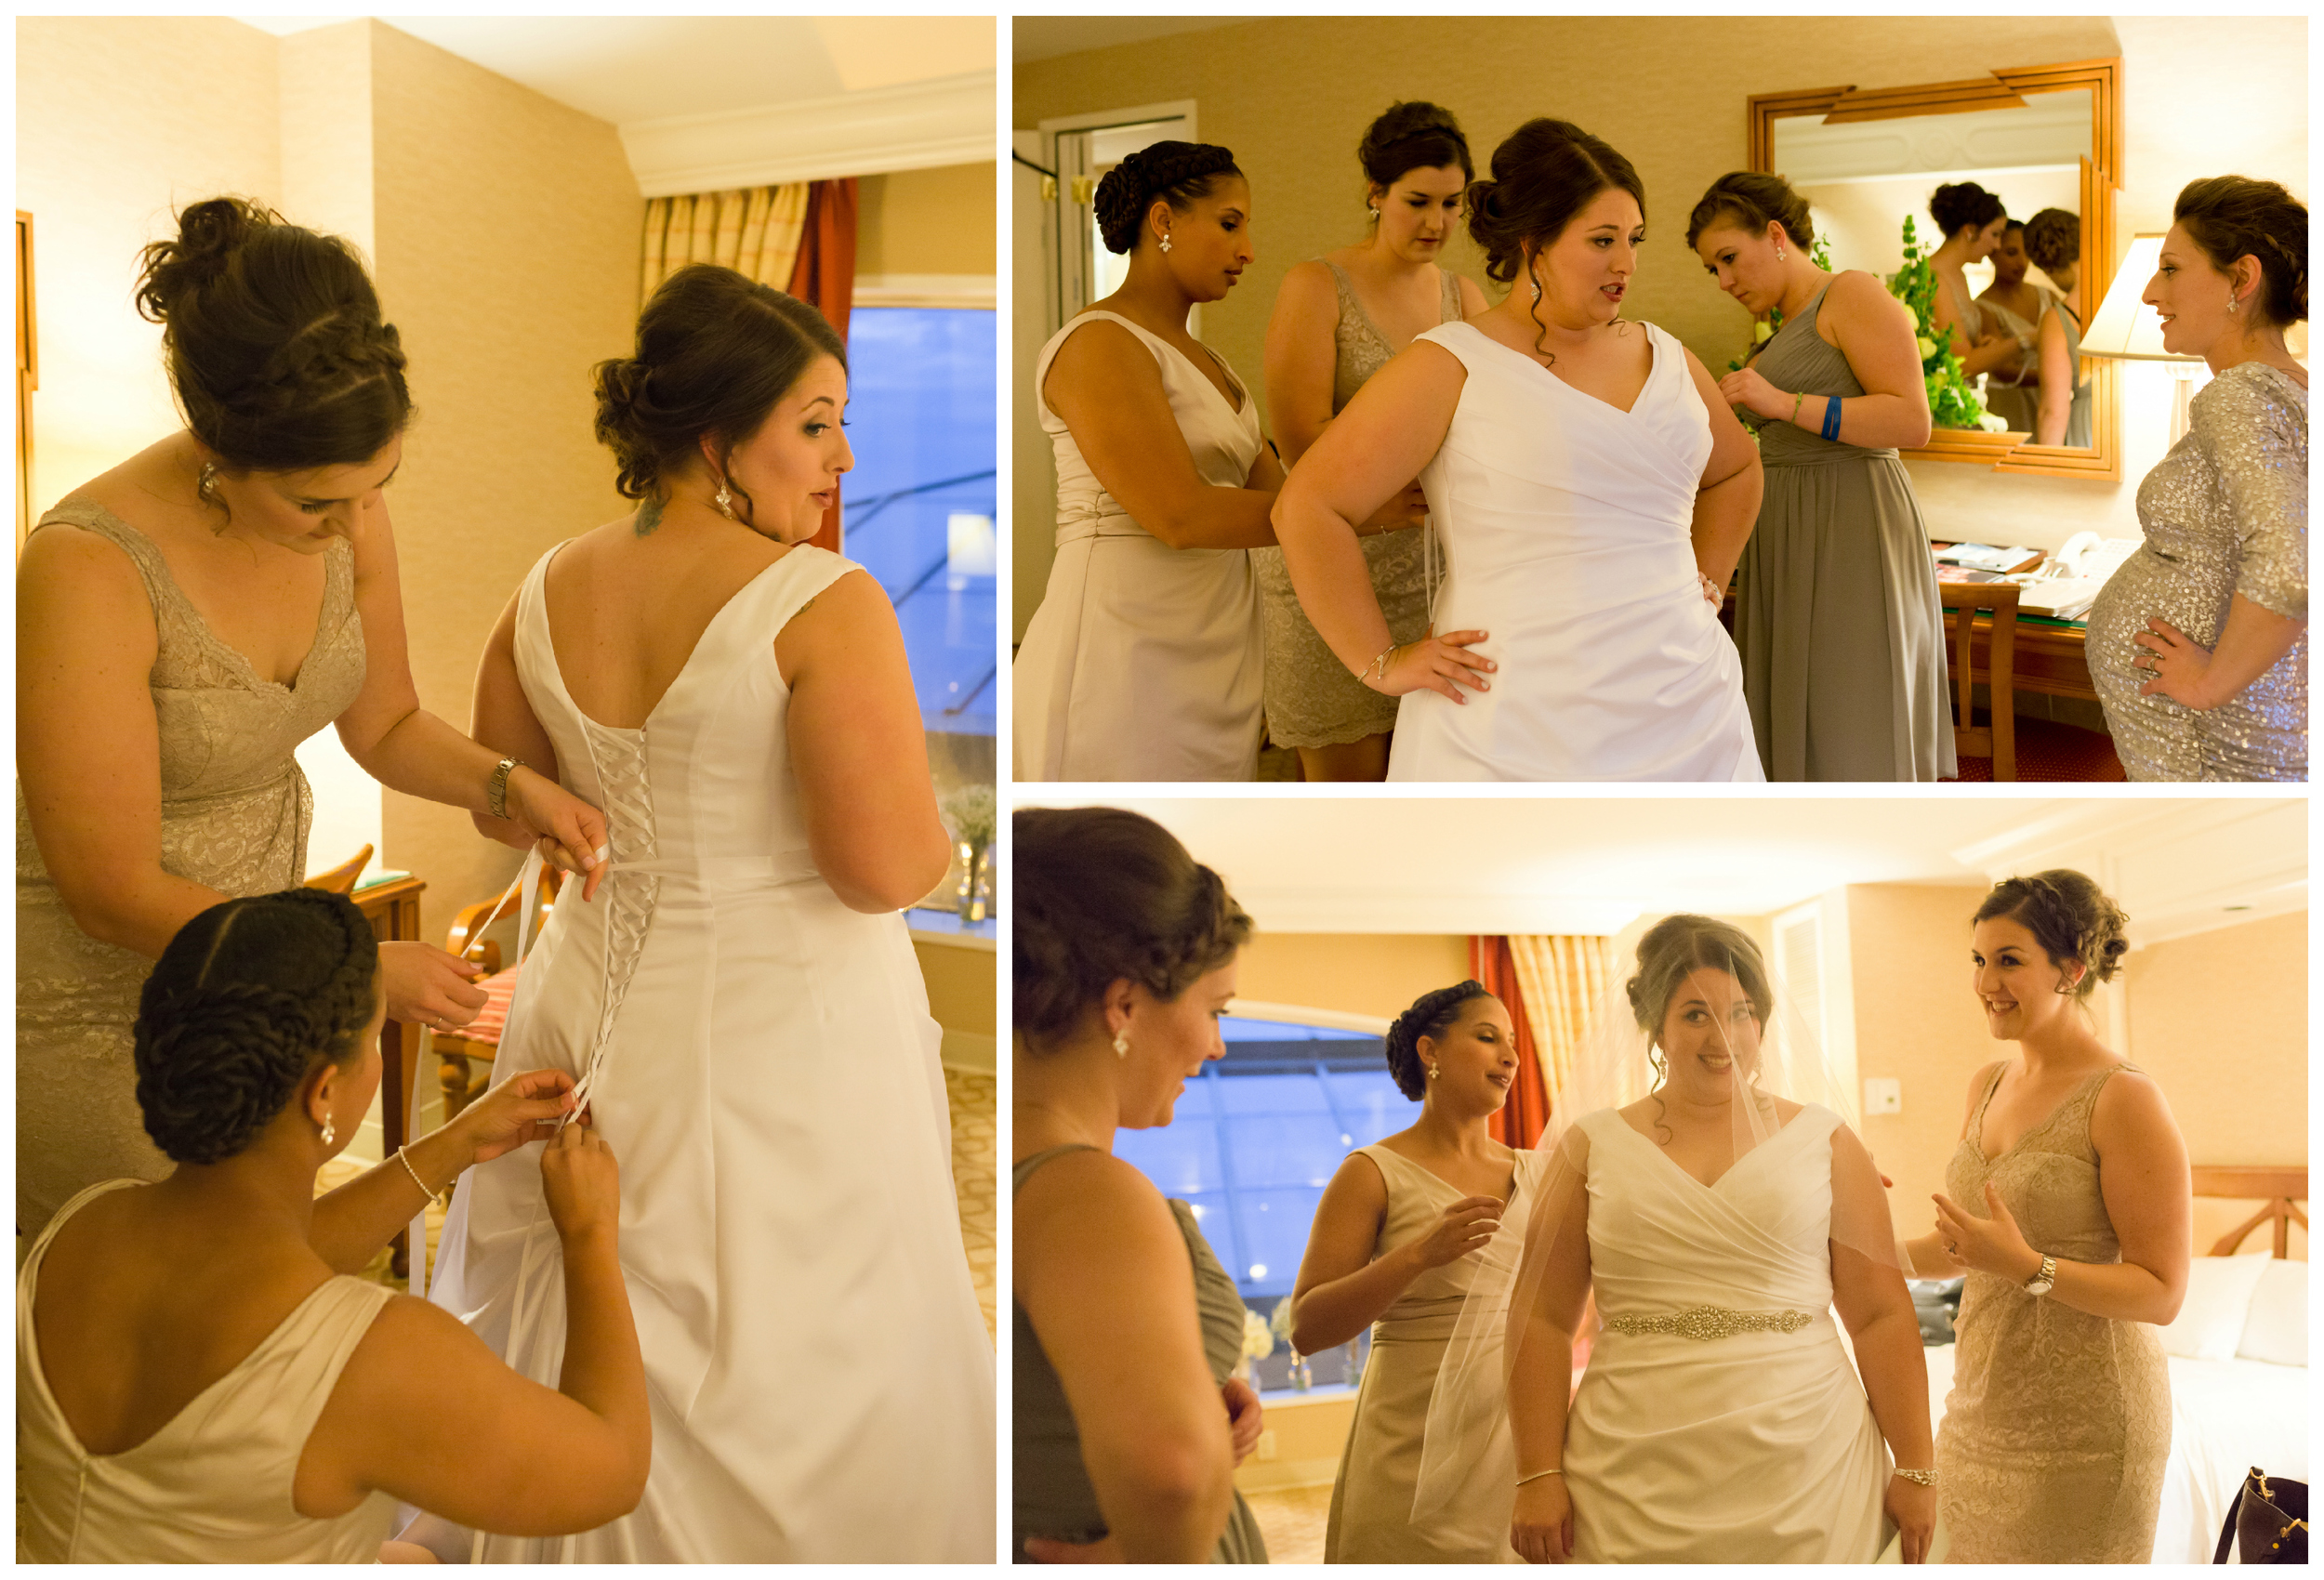 bridesmaids helping bride put on wedding dress in hotel room